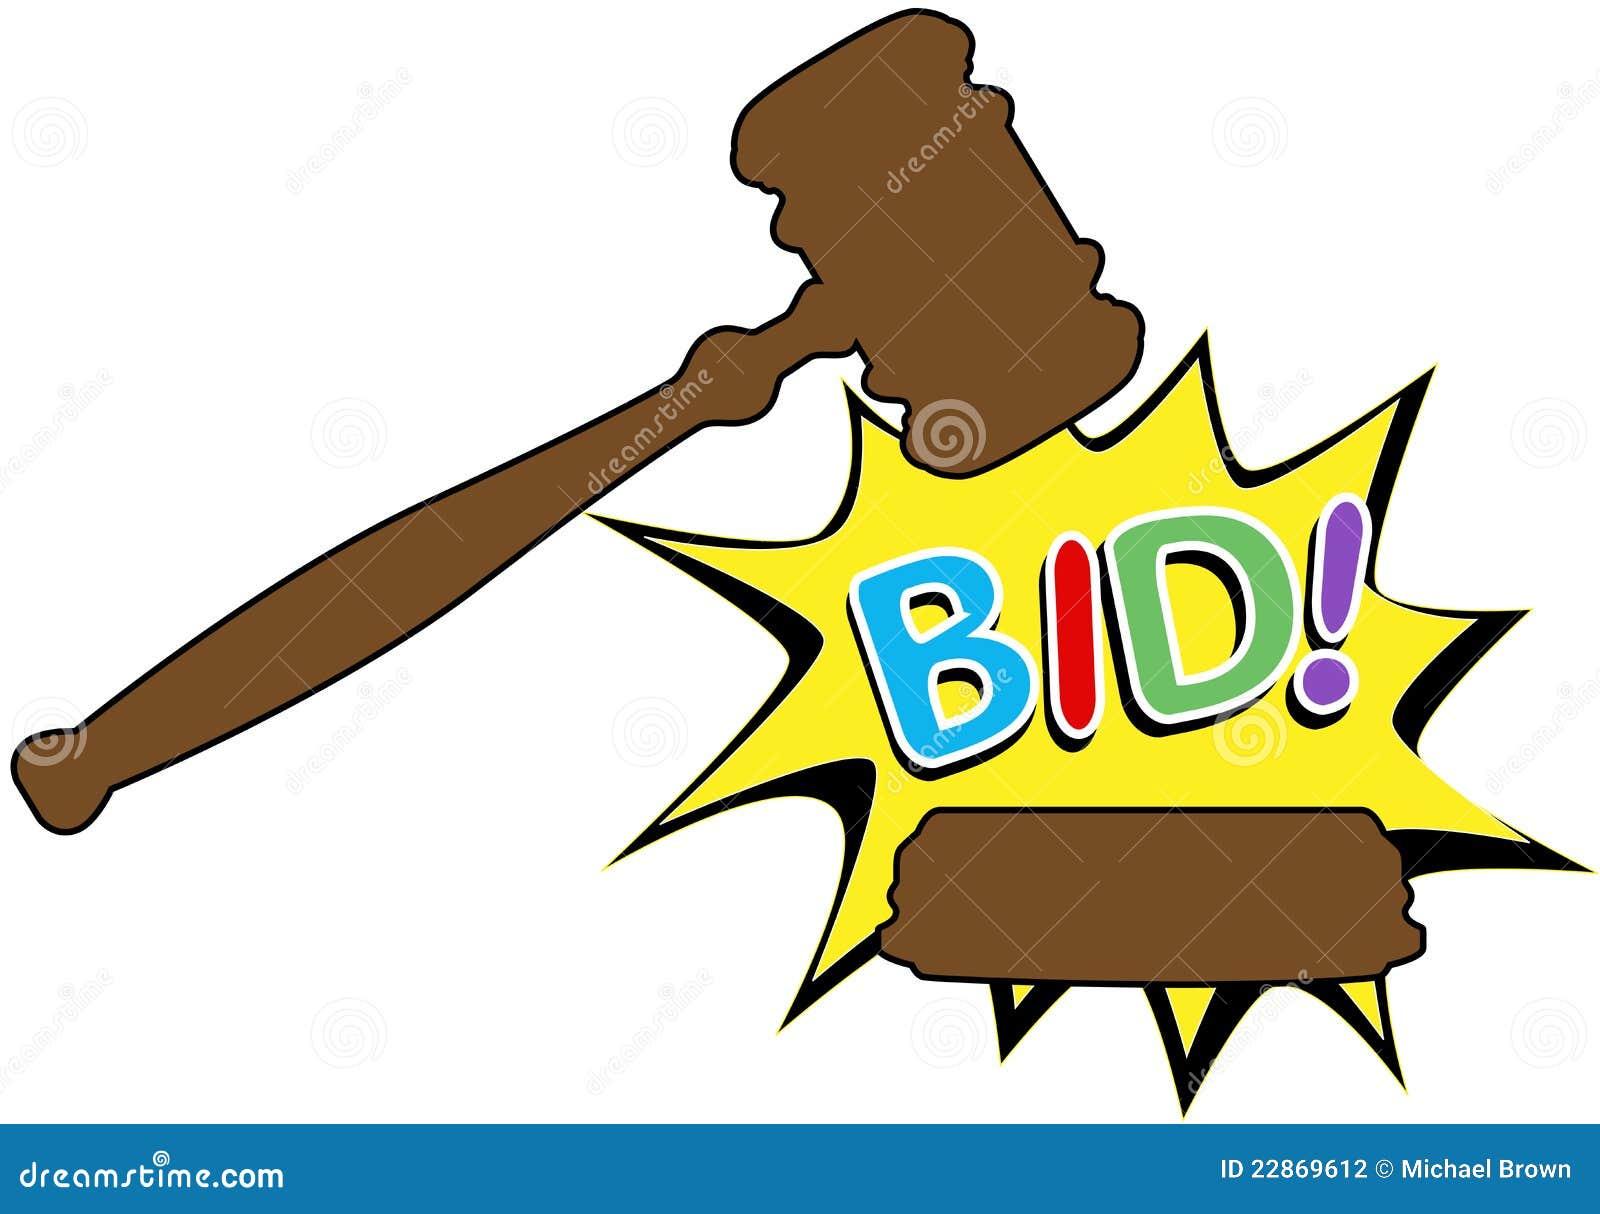 Auction Gavel Sold Cartoon Icon Royalty Free Stock Photo - Image ...